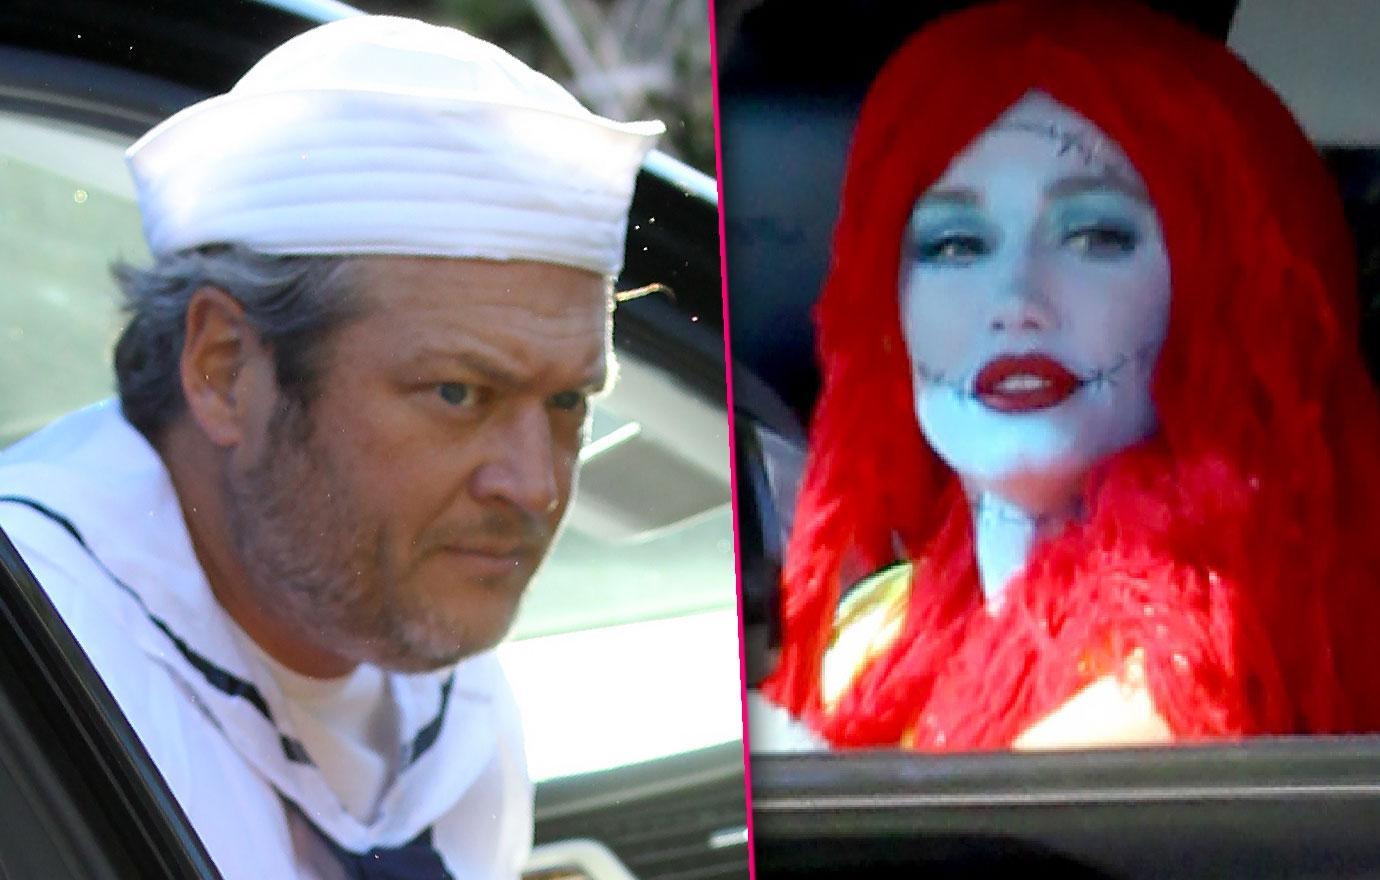 Gwen Stefani And Blake Shelton Take Kids To Halloween Party